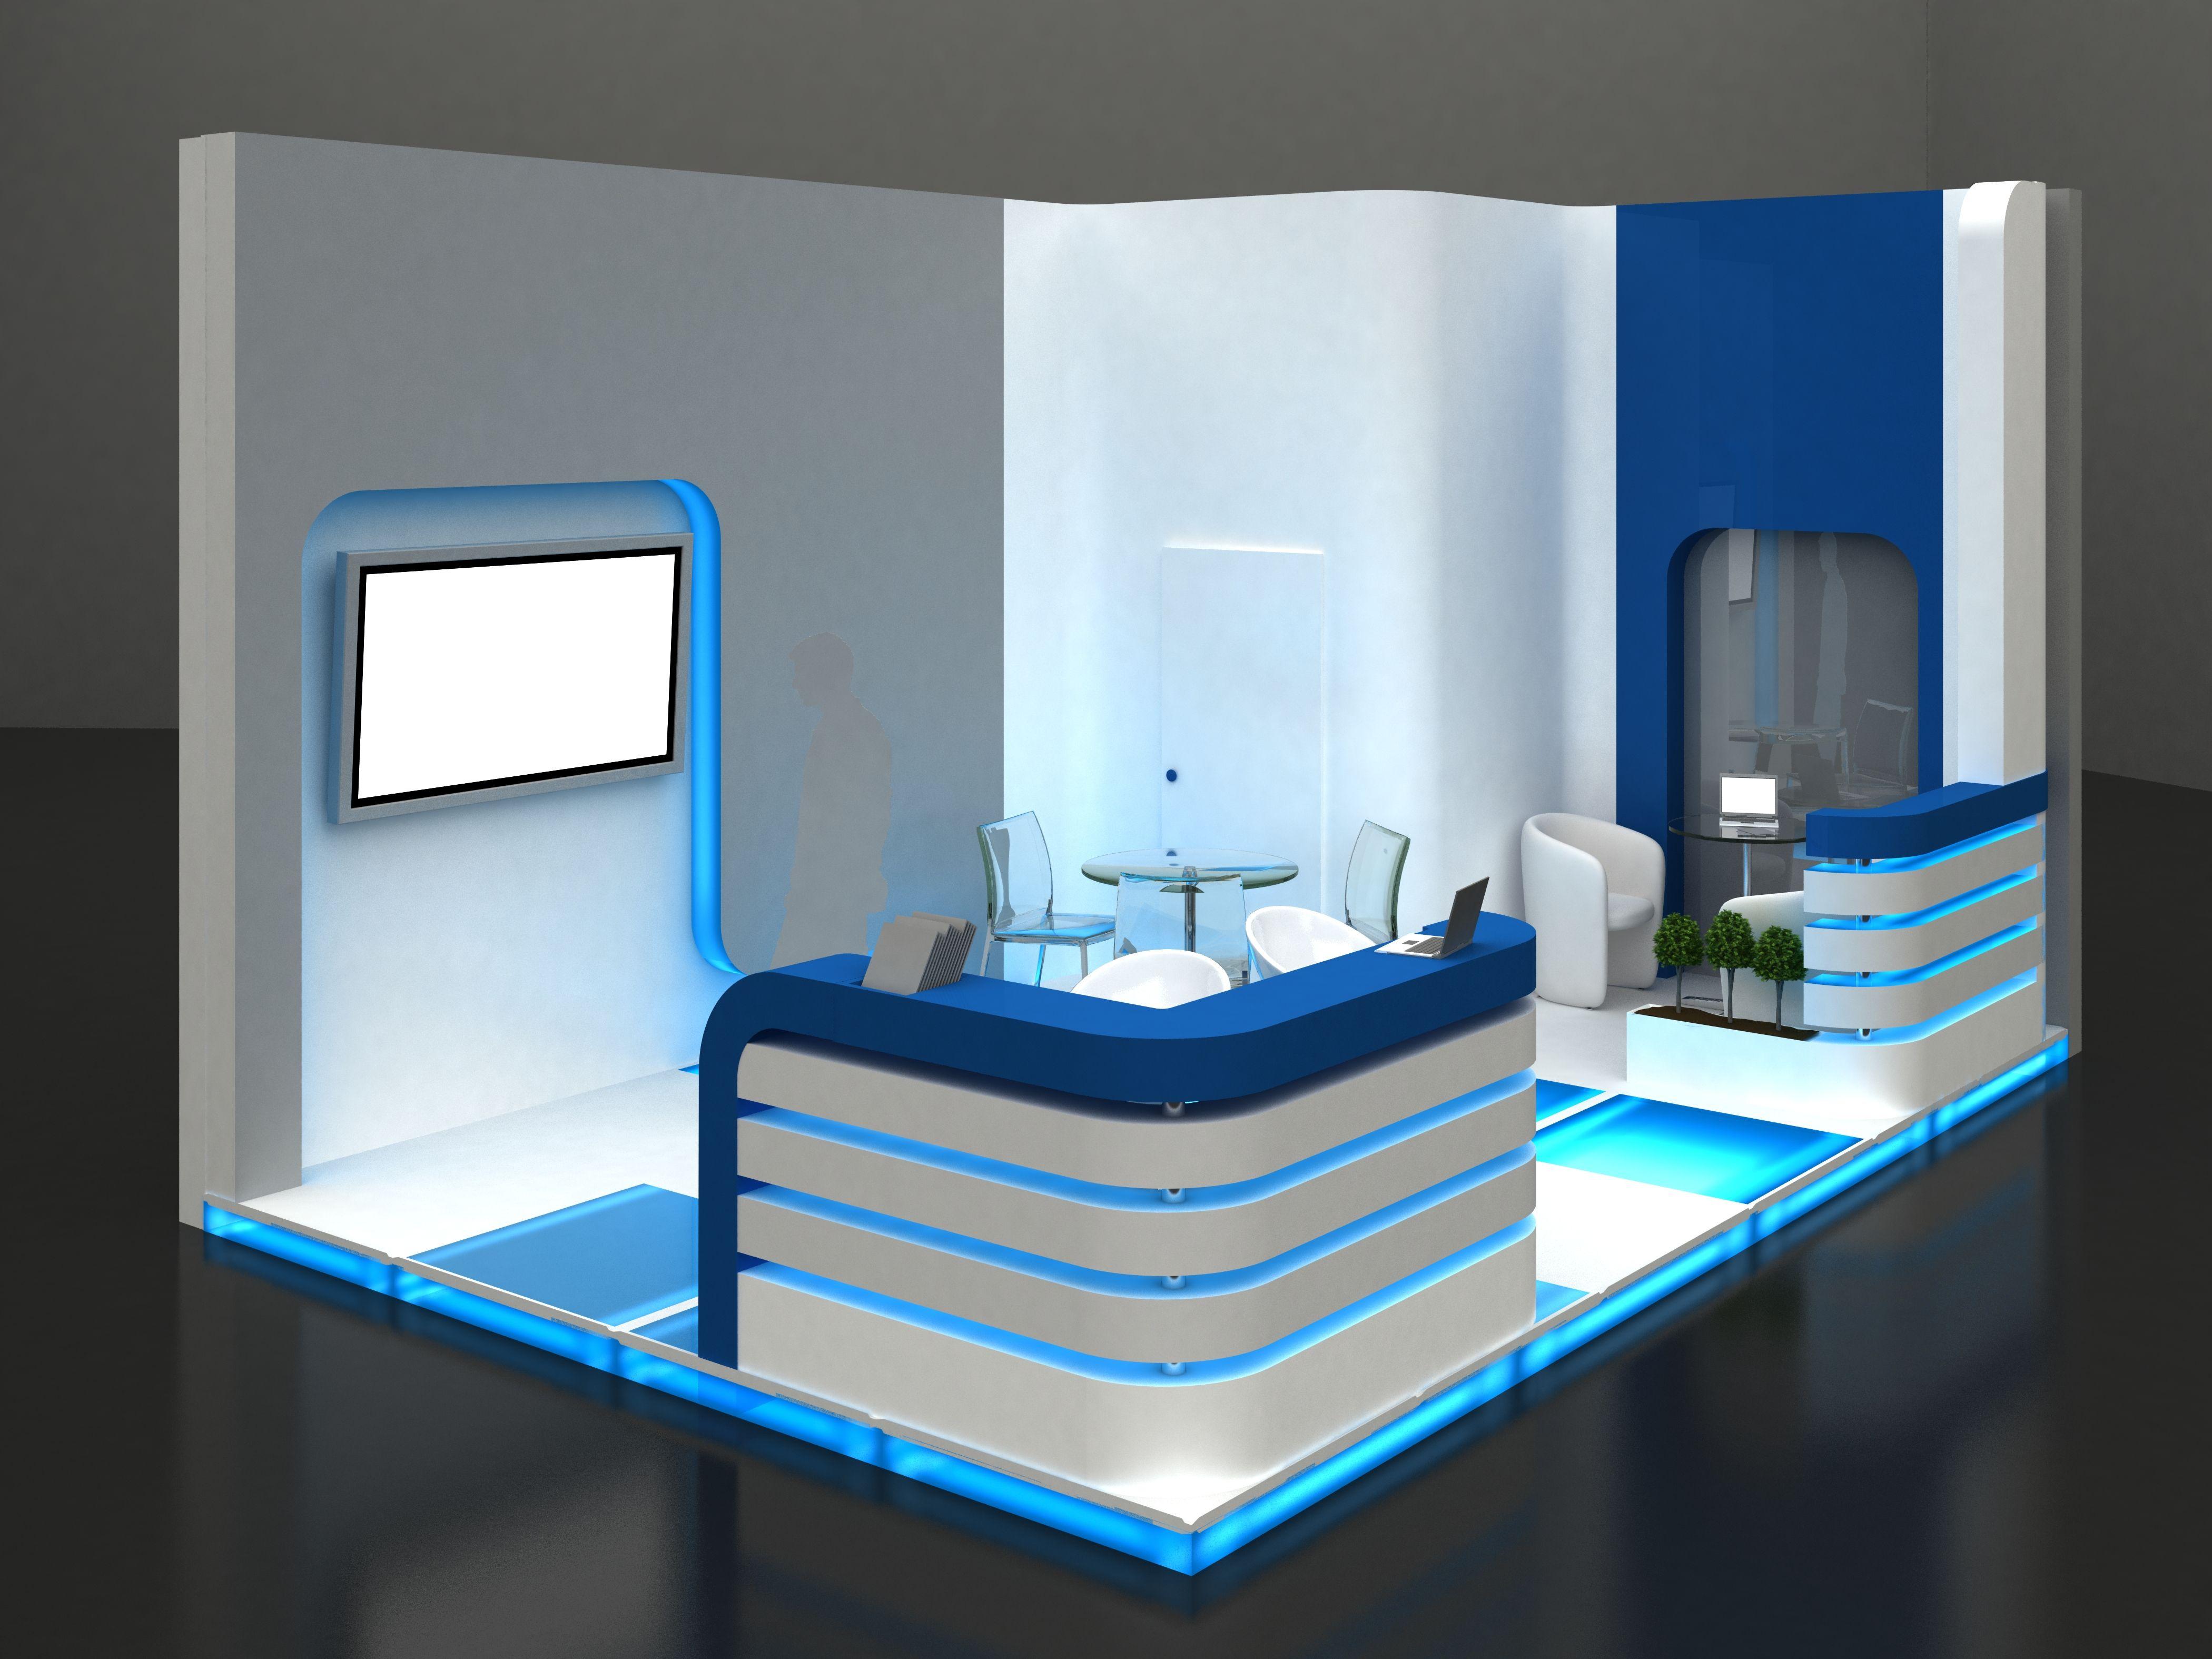 Dise os de stand servicios de tavola for Disenos de stand para exposiciones